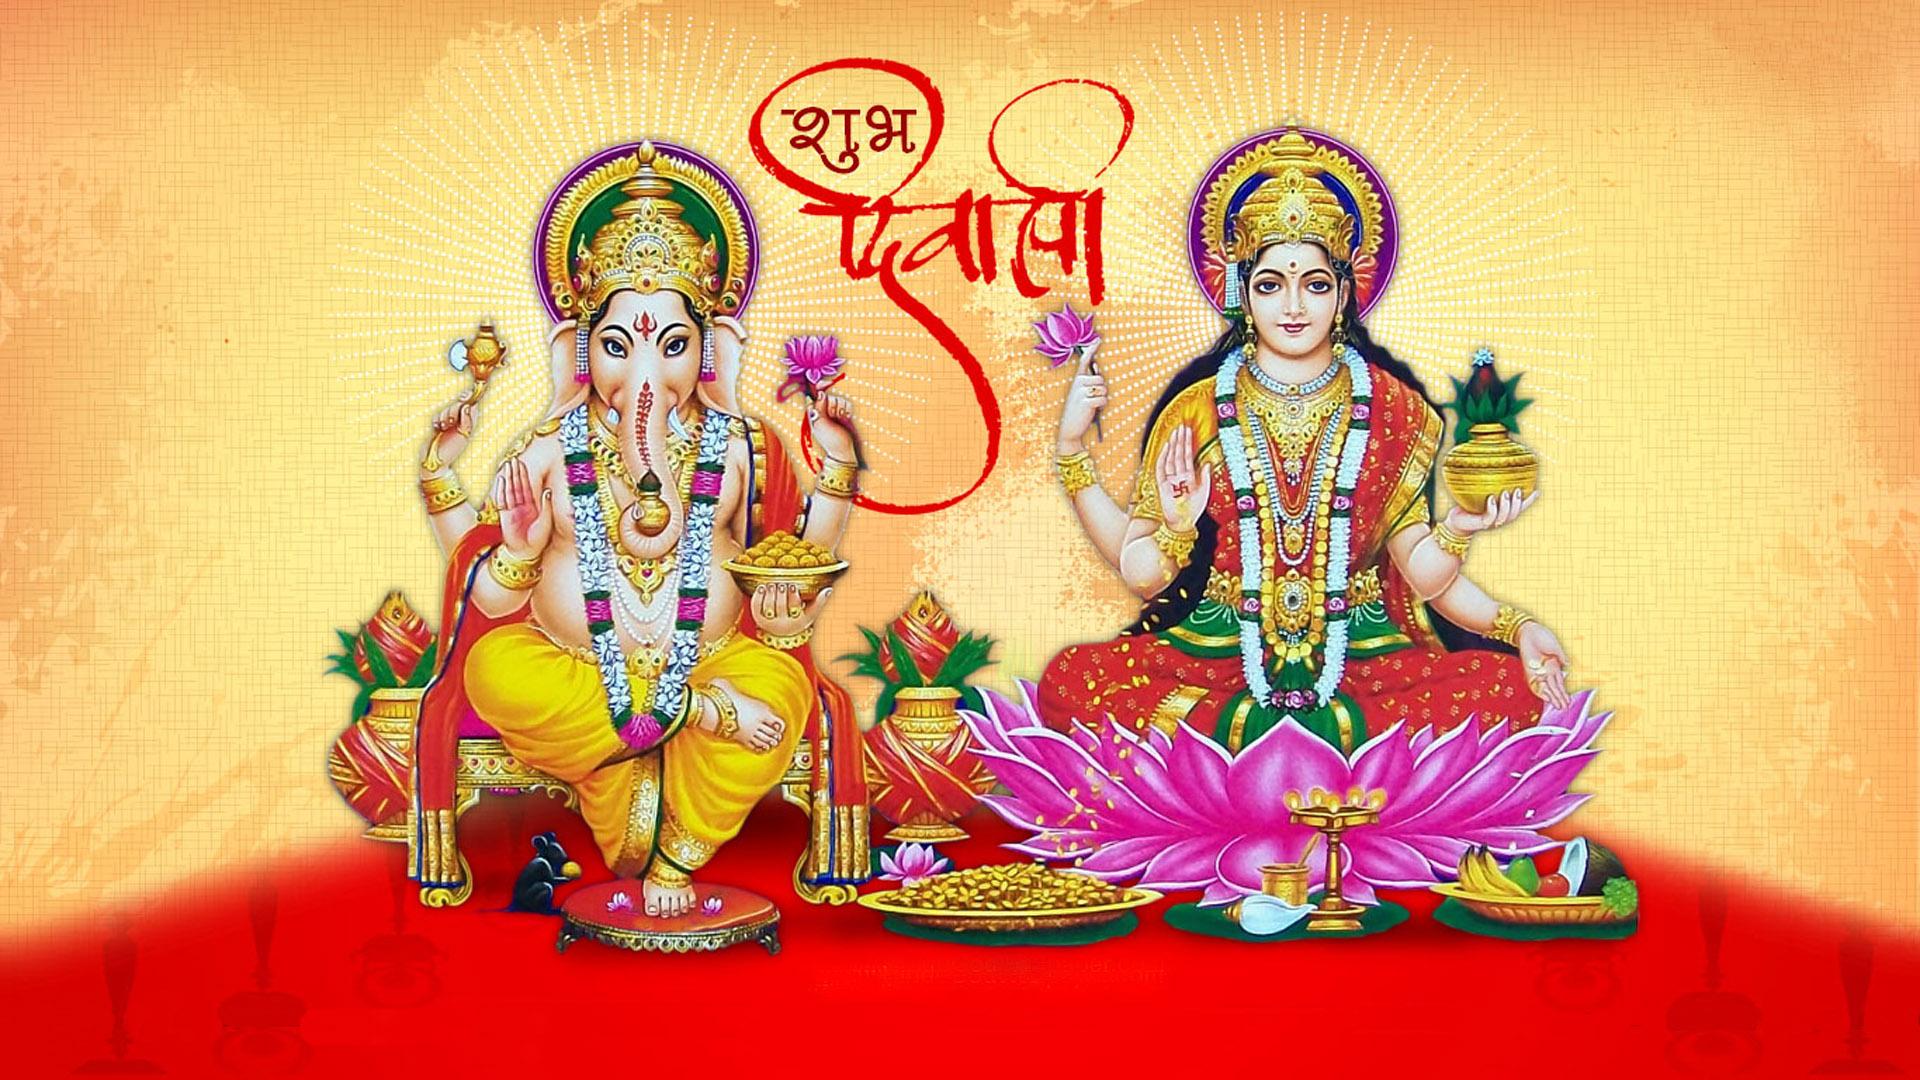 Desktop Wallpaper Hd 3d Full Screen God Ganesh Laxmi Ganesh Desktop Hd Wallpapers For Mobile Phones And